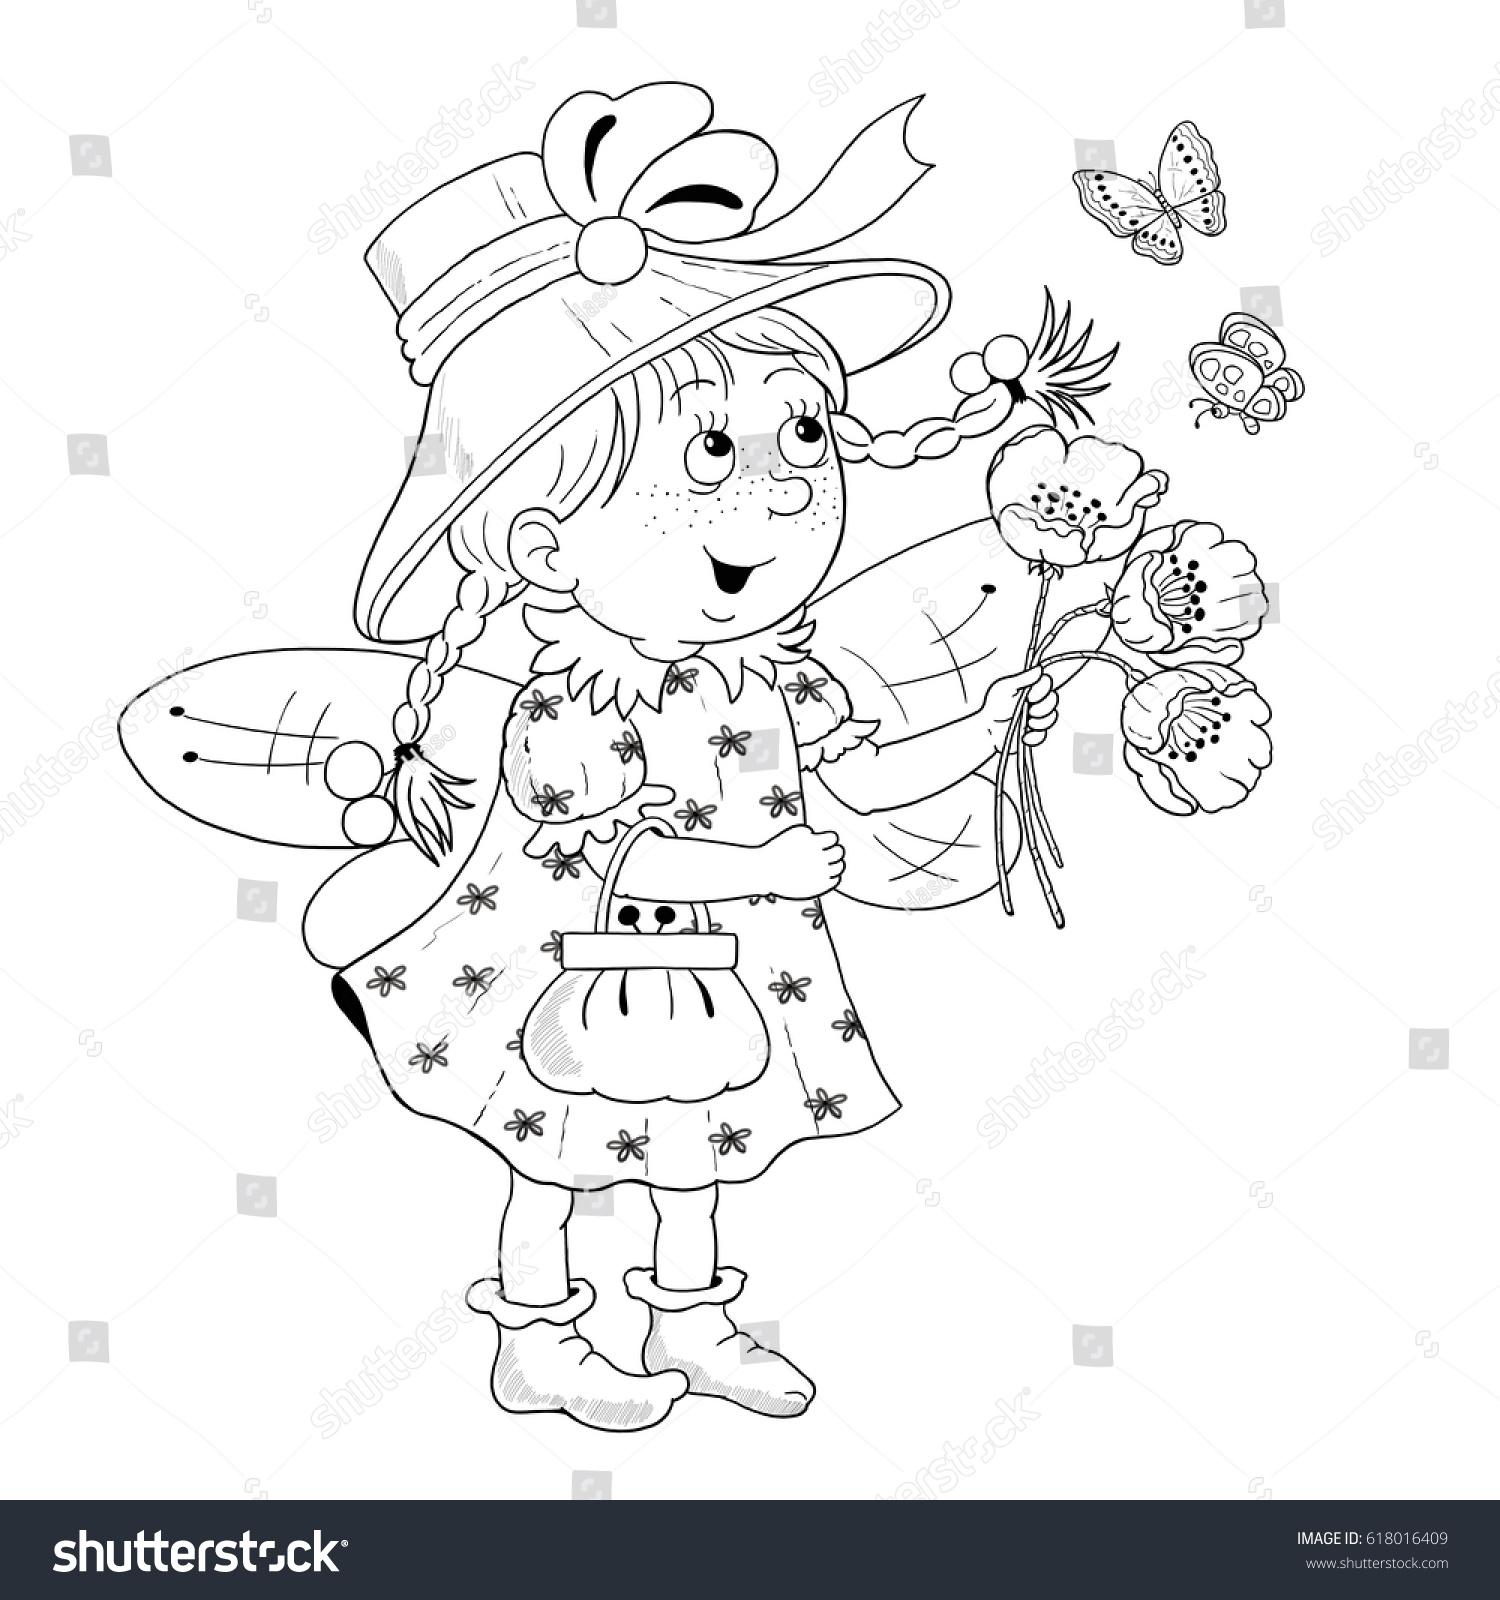 Cute Pretty Fairy Flowers Fairy Tale Stock Illustration 618016409 ...